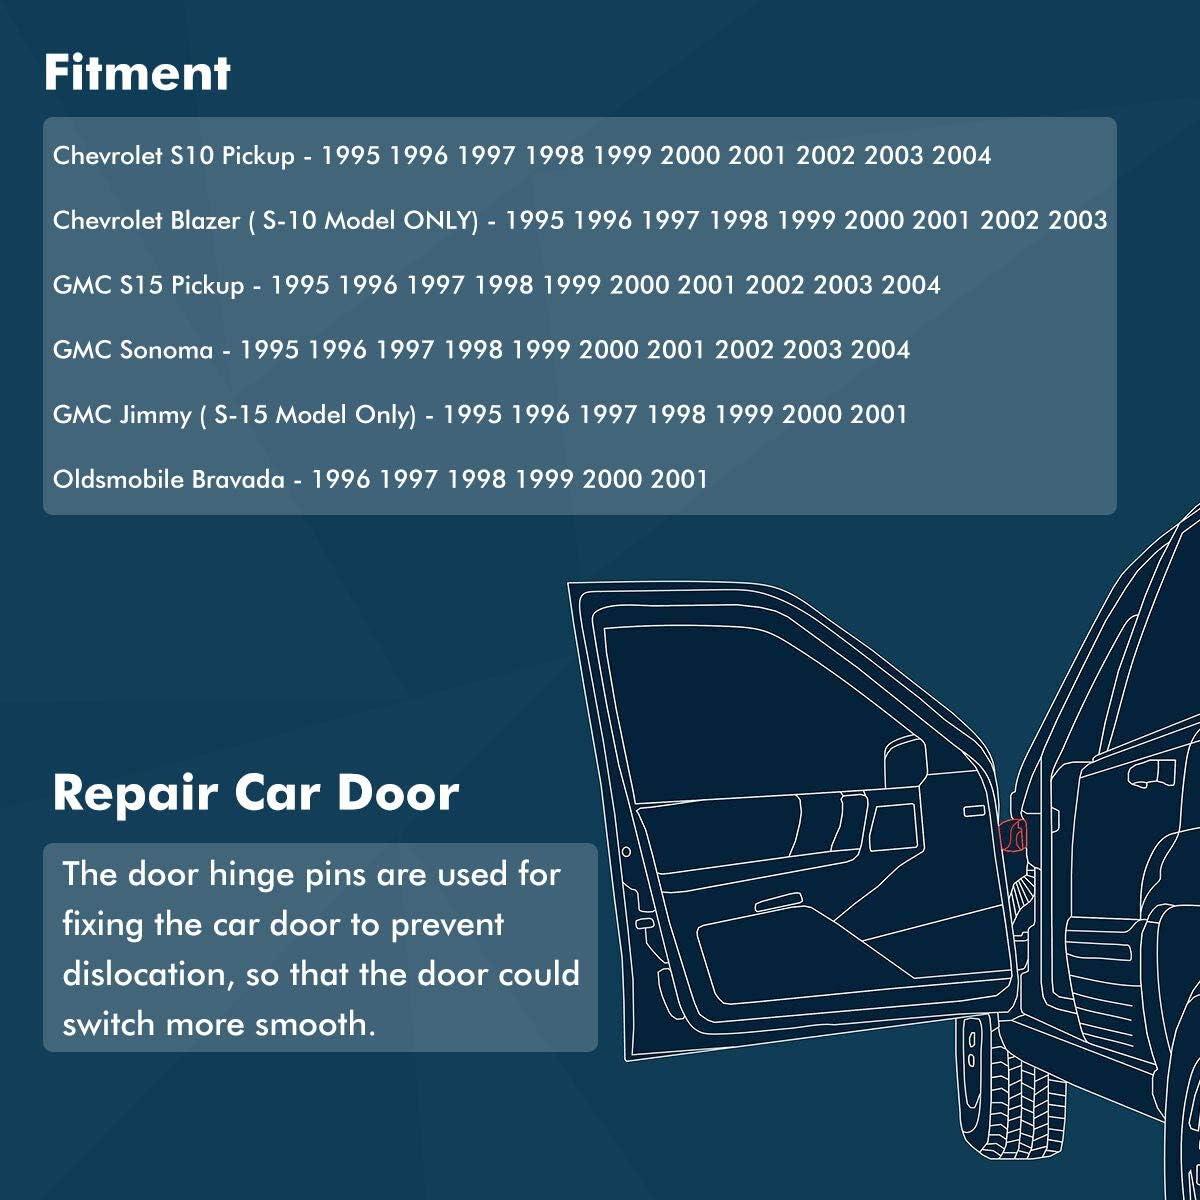 Newace Door Hinge Pin for 1994-2004 Chevy S10 /& GMC S15 Bushing Repair Kits 4 pins 2 Door